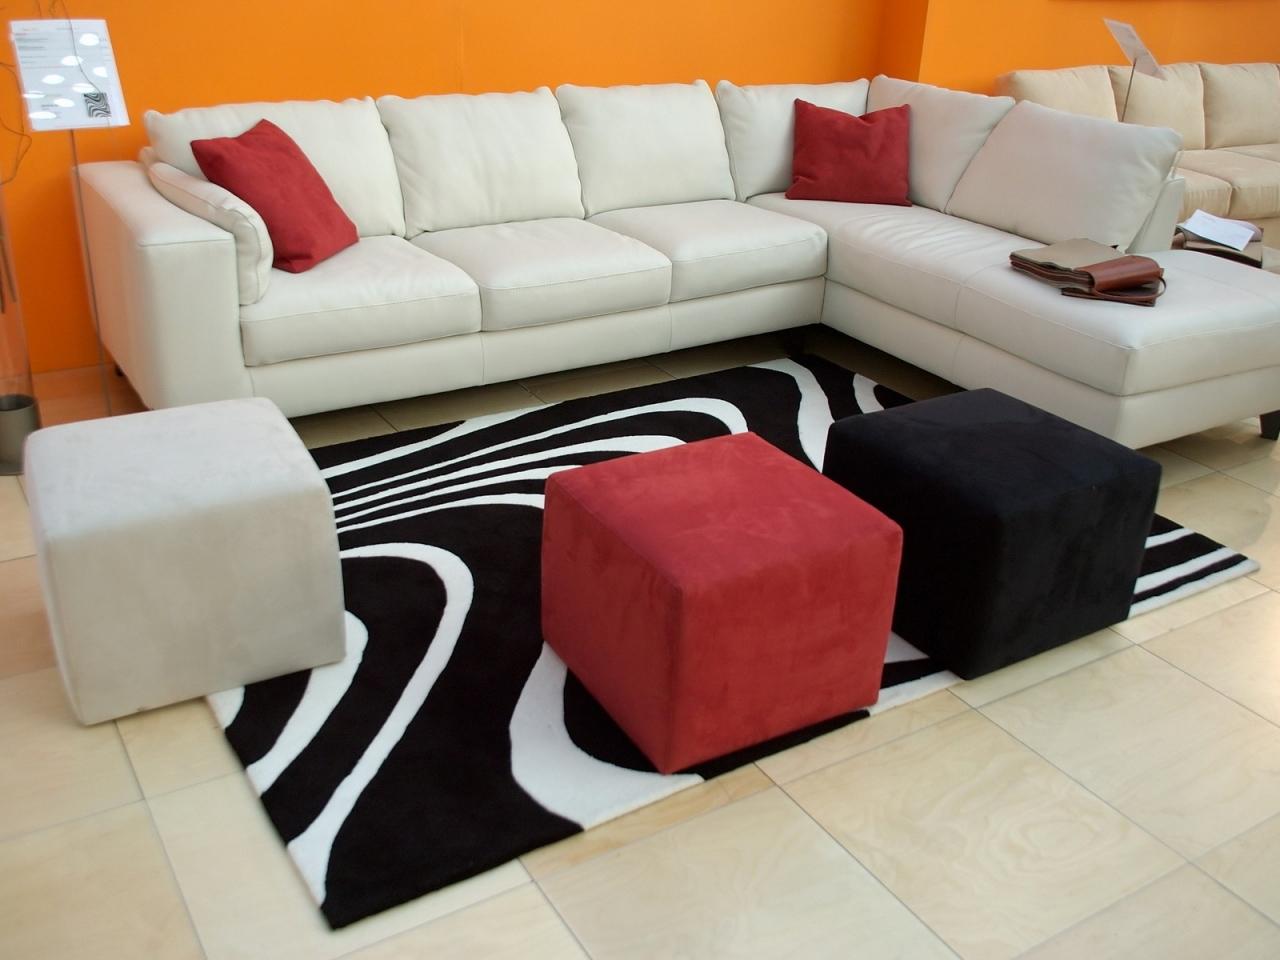 Modelos de muebles - 1280x960